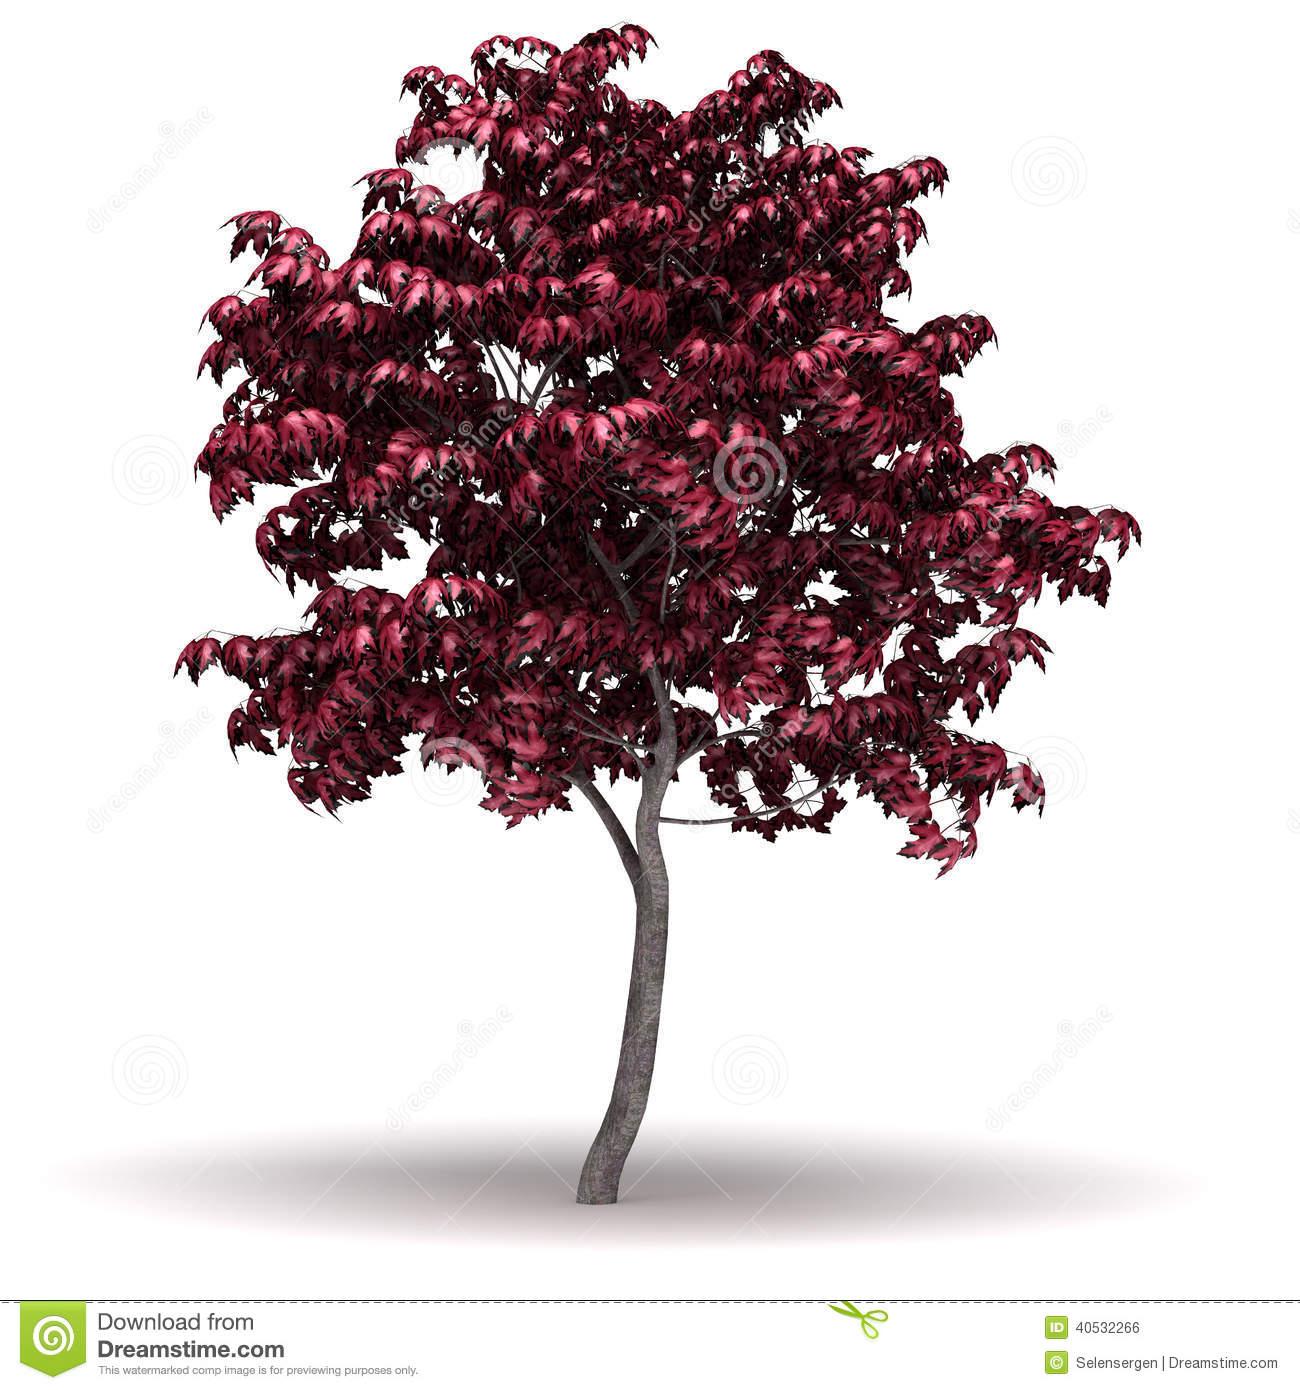 Acer palmatum clipart - Clipground